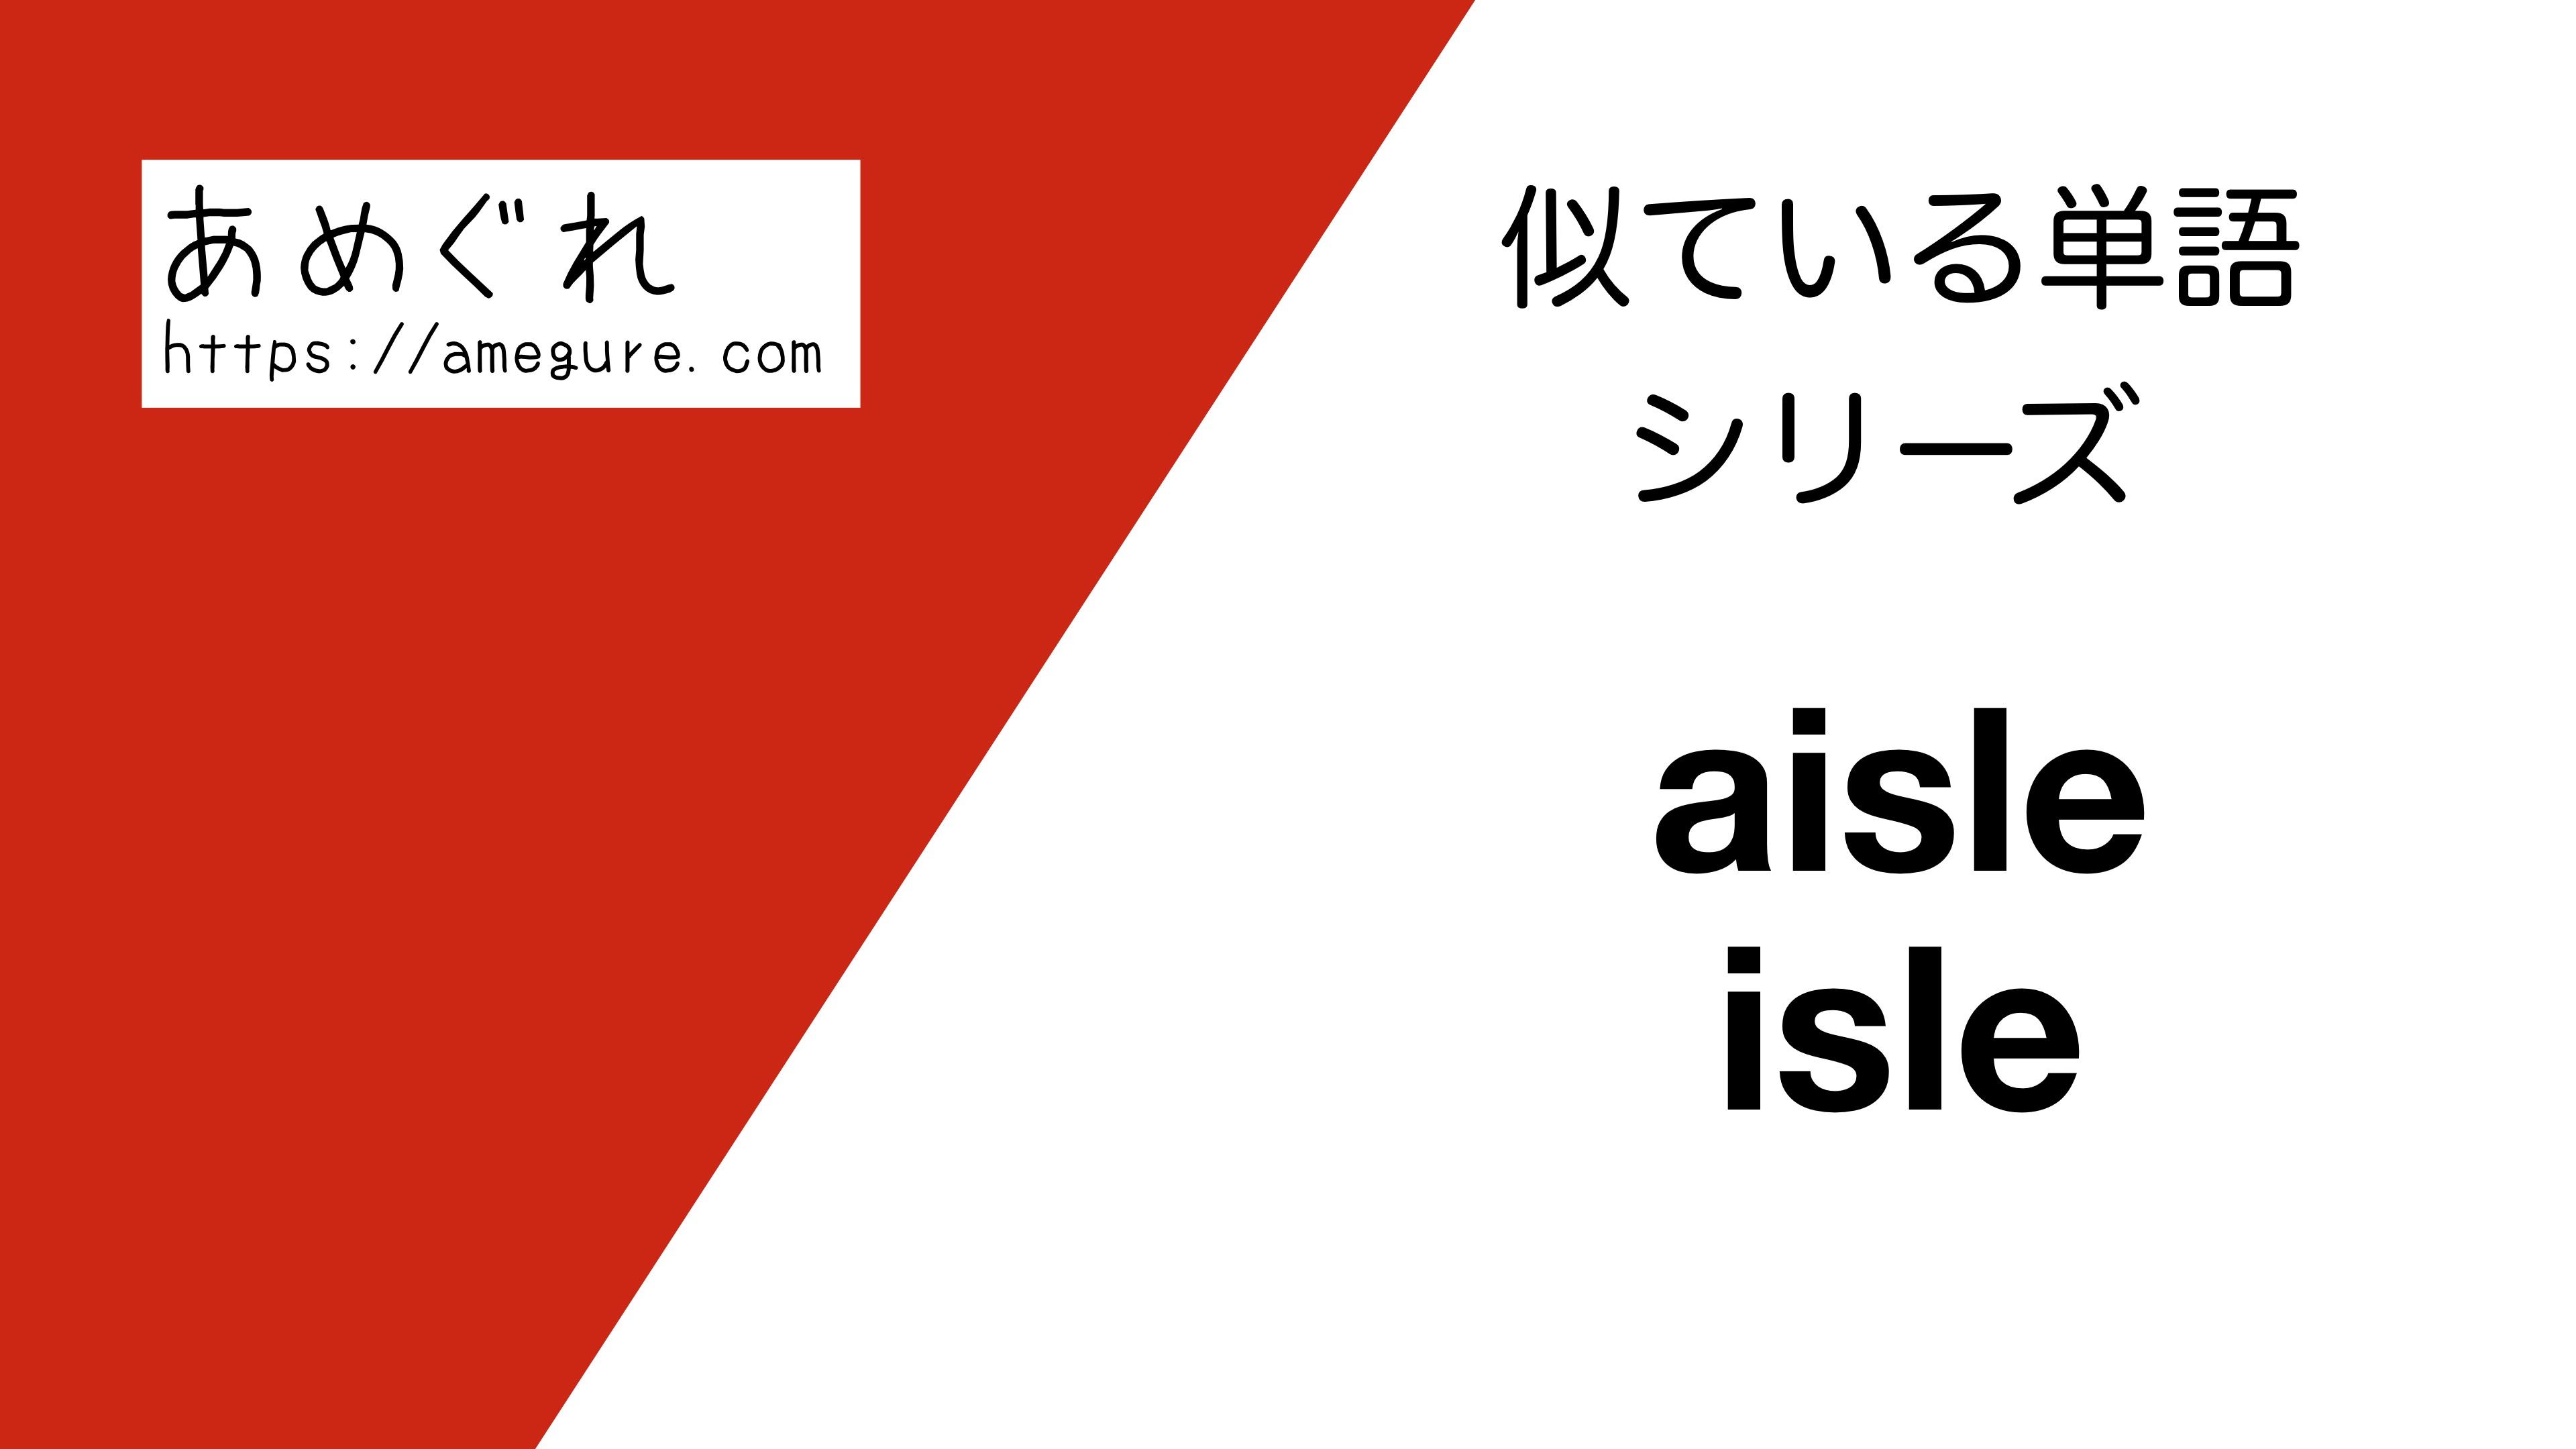 aisle-isle違い